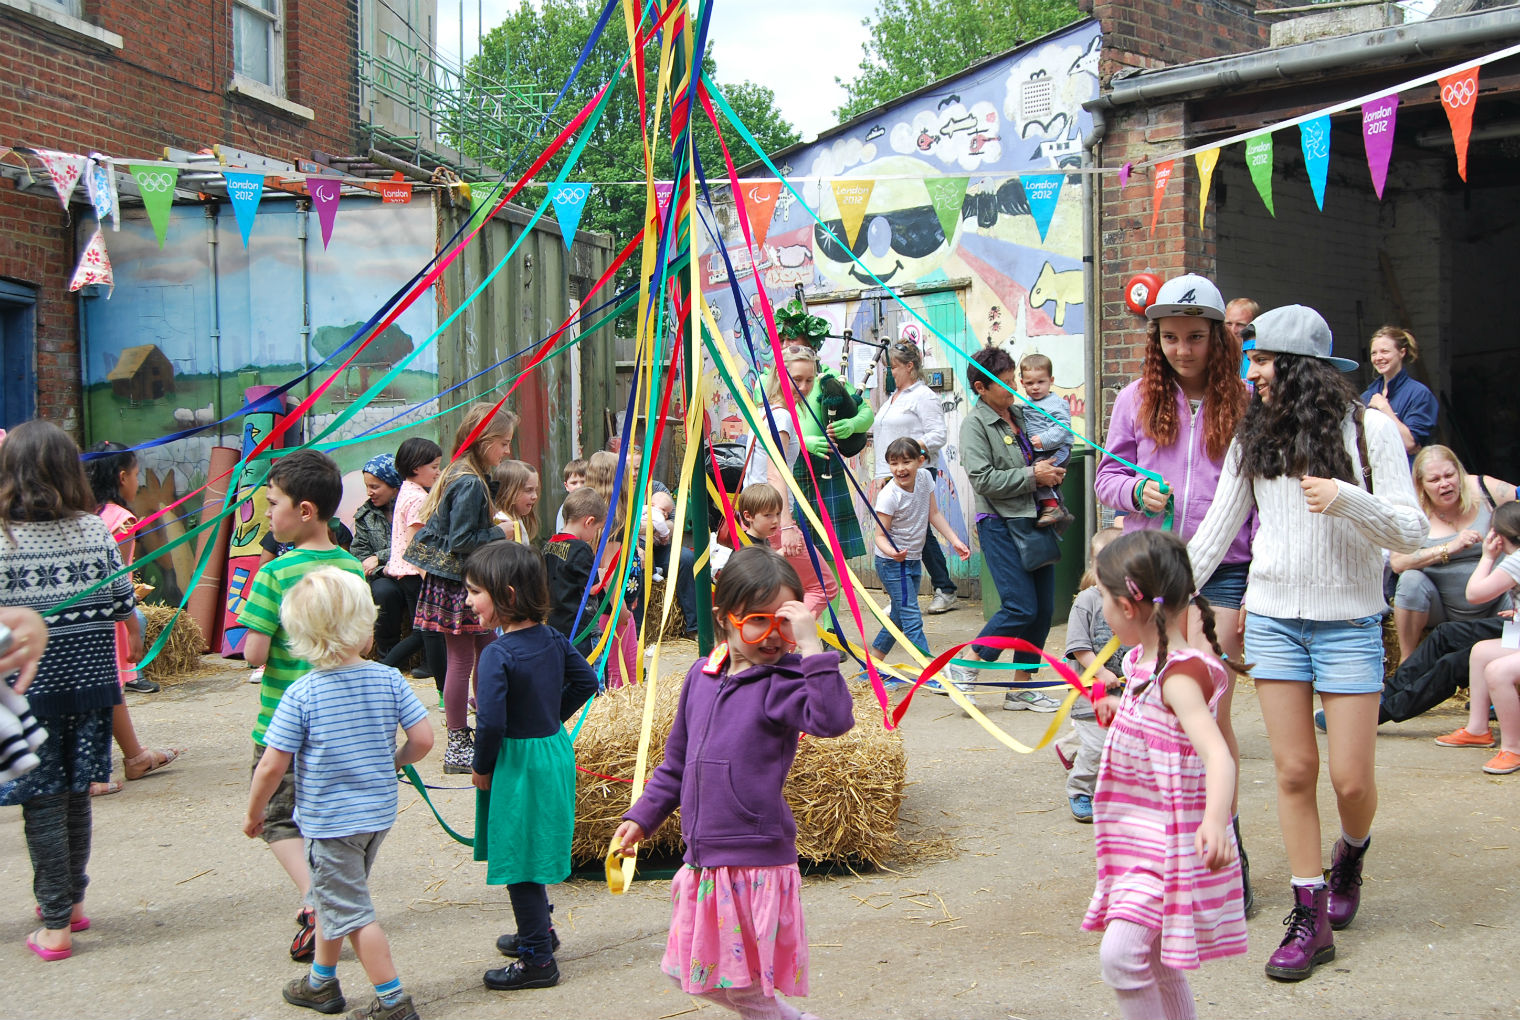 Cute: may pole dancing at last year's festival. Photo: KTCF